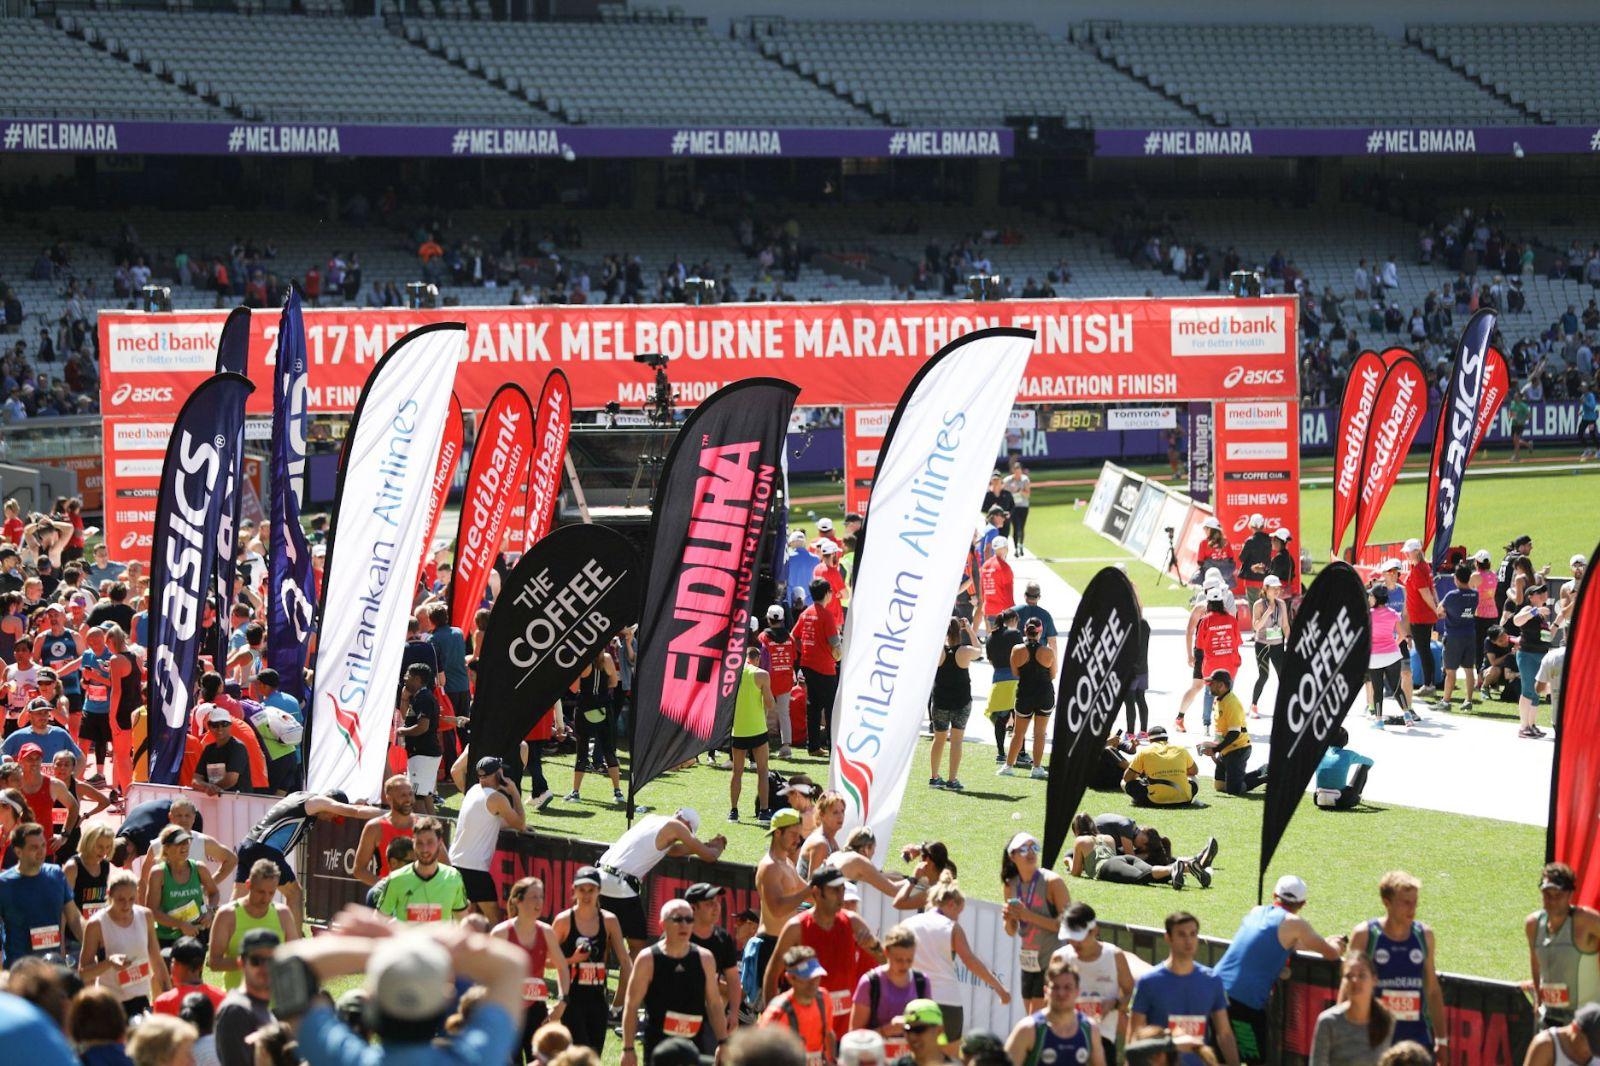 Melobourne marathon picture 5